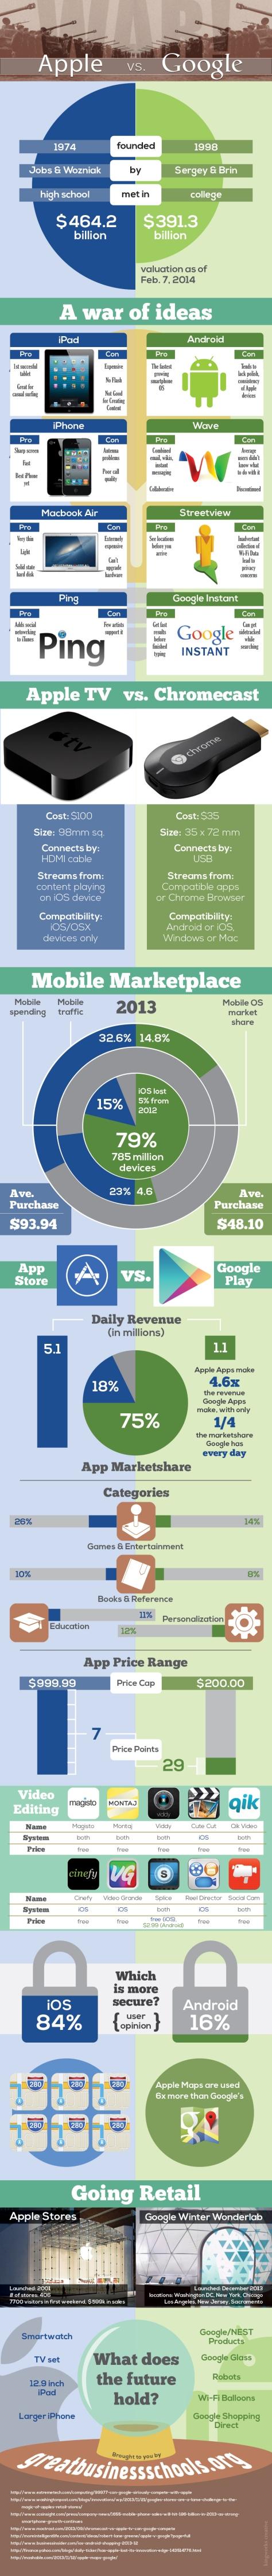 google-vs-apple_900